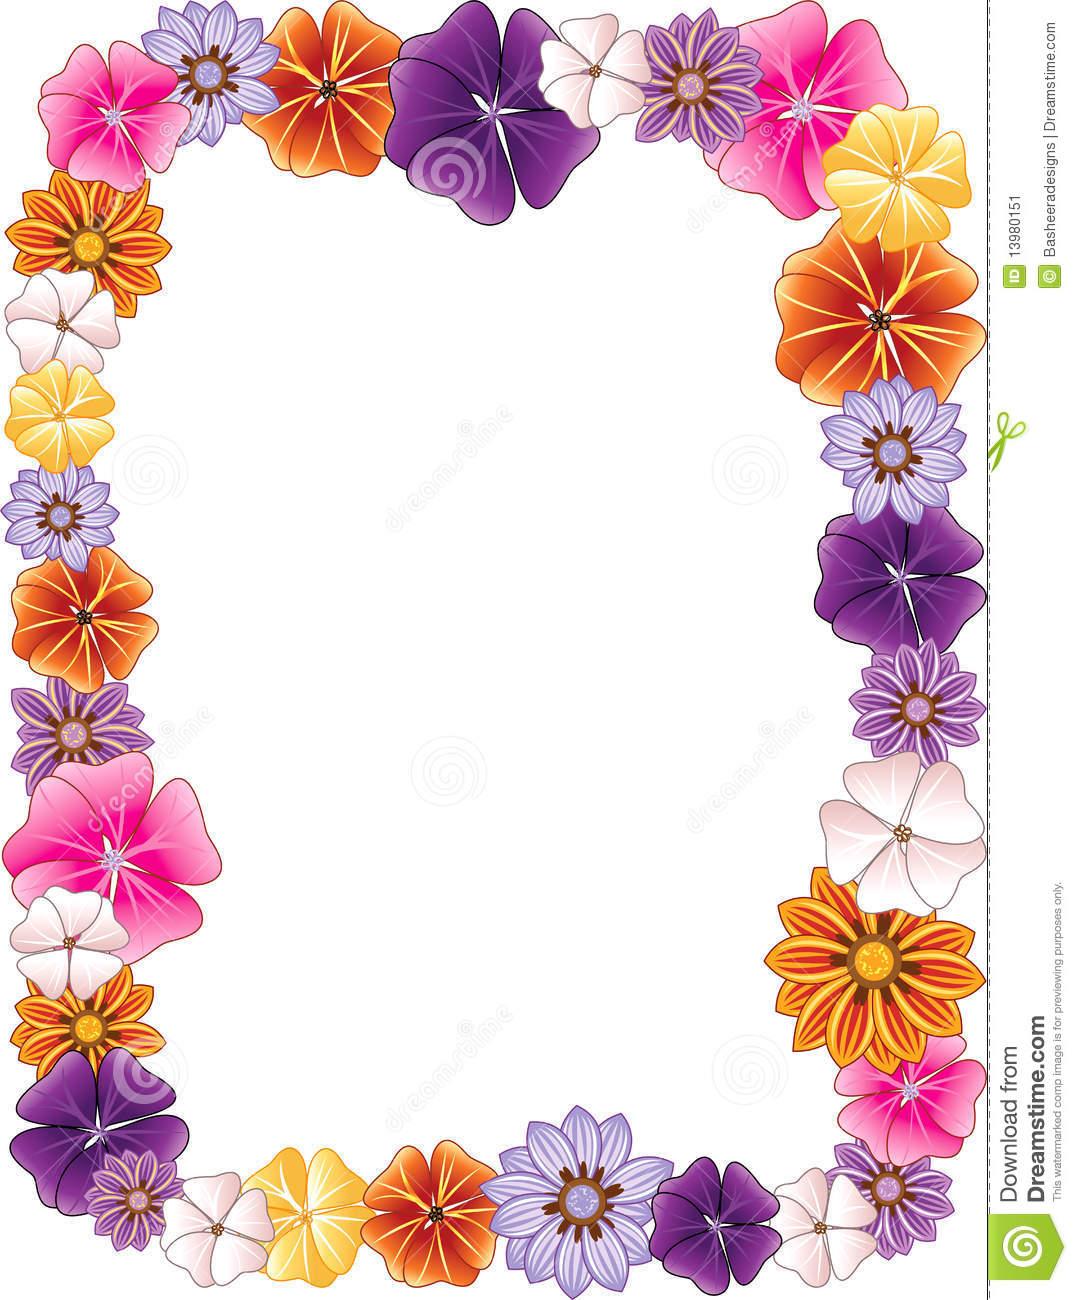 Daisy flower border clip art real clipart and vector graphics hawaiian flower border clip art clipart panda free clipart images rh clipartpanda com daisy flower border clip art izmirmasajfo